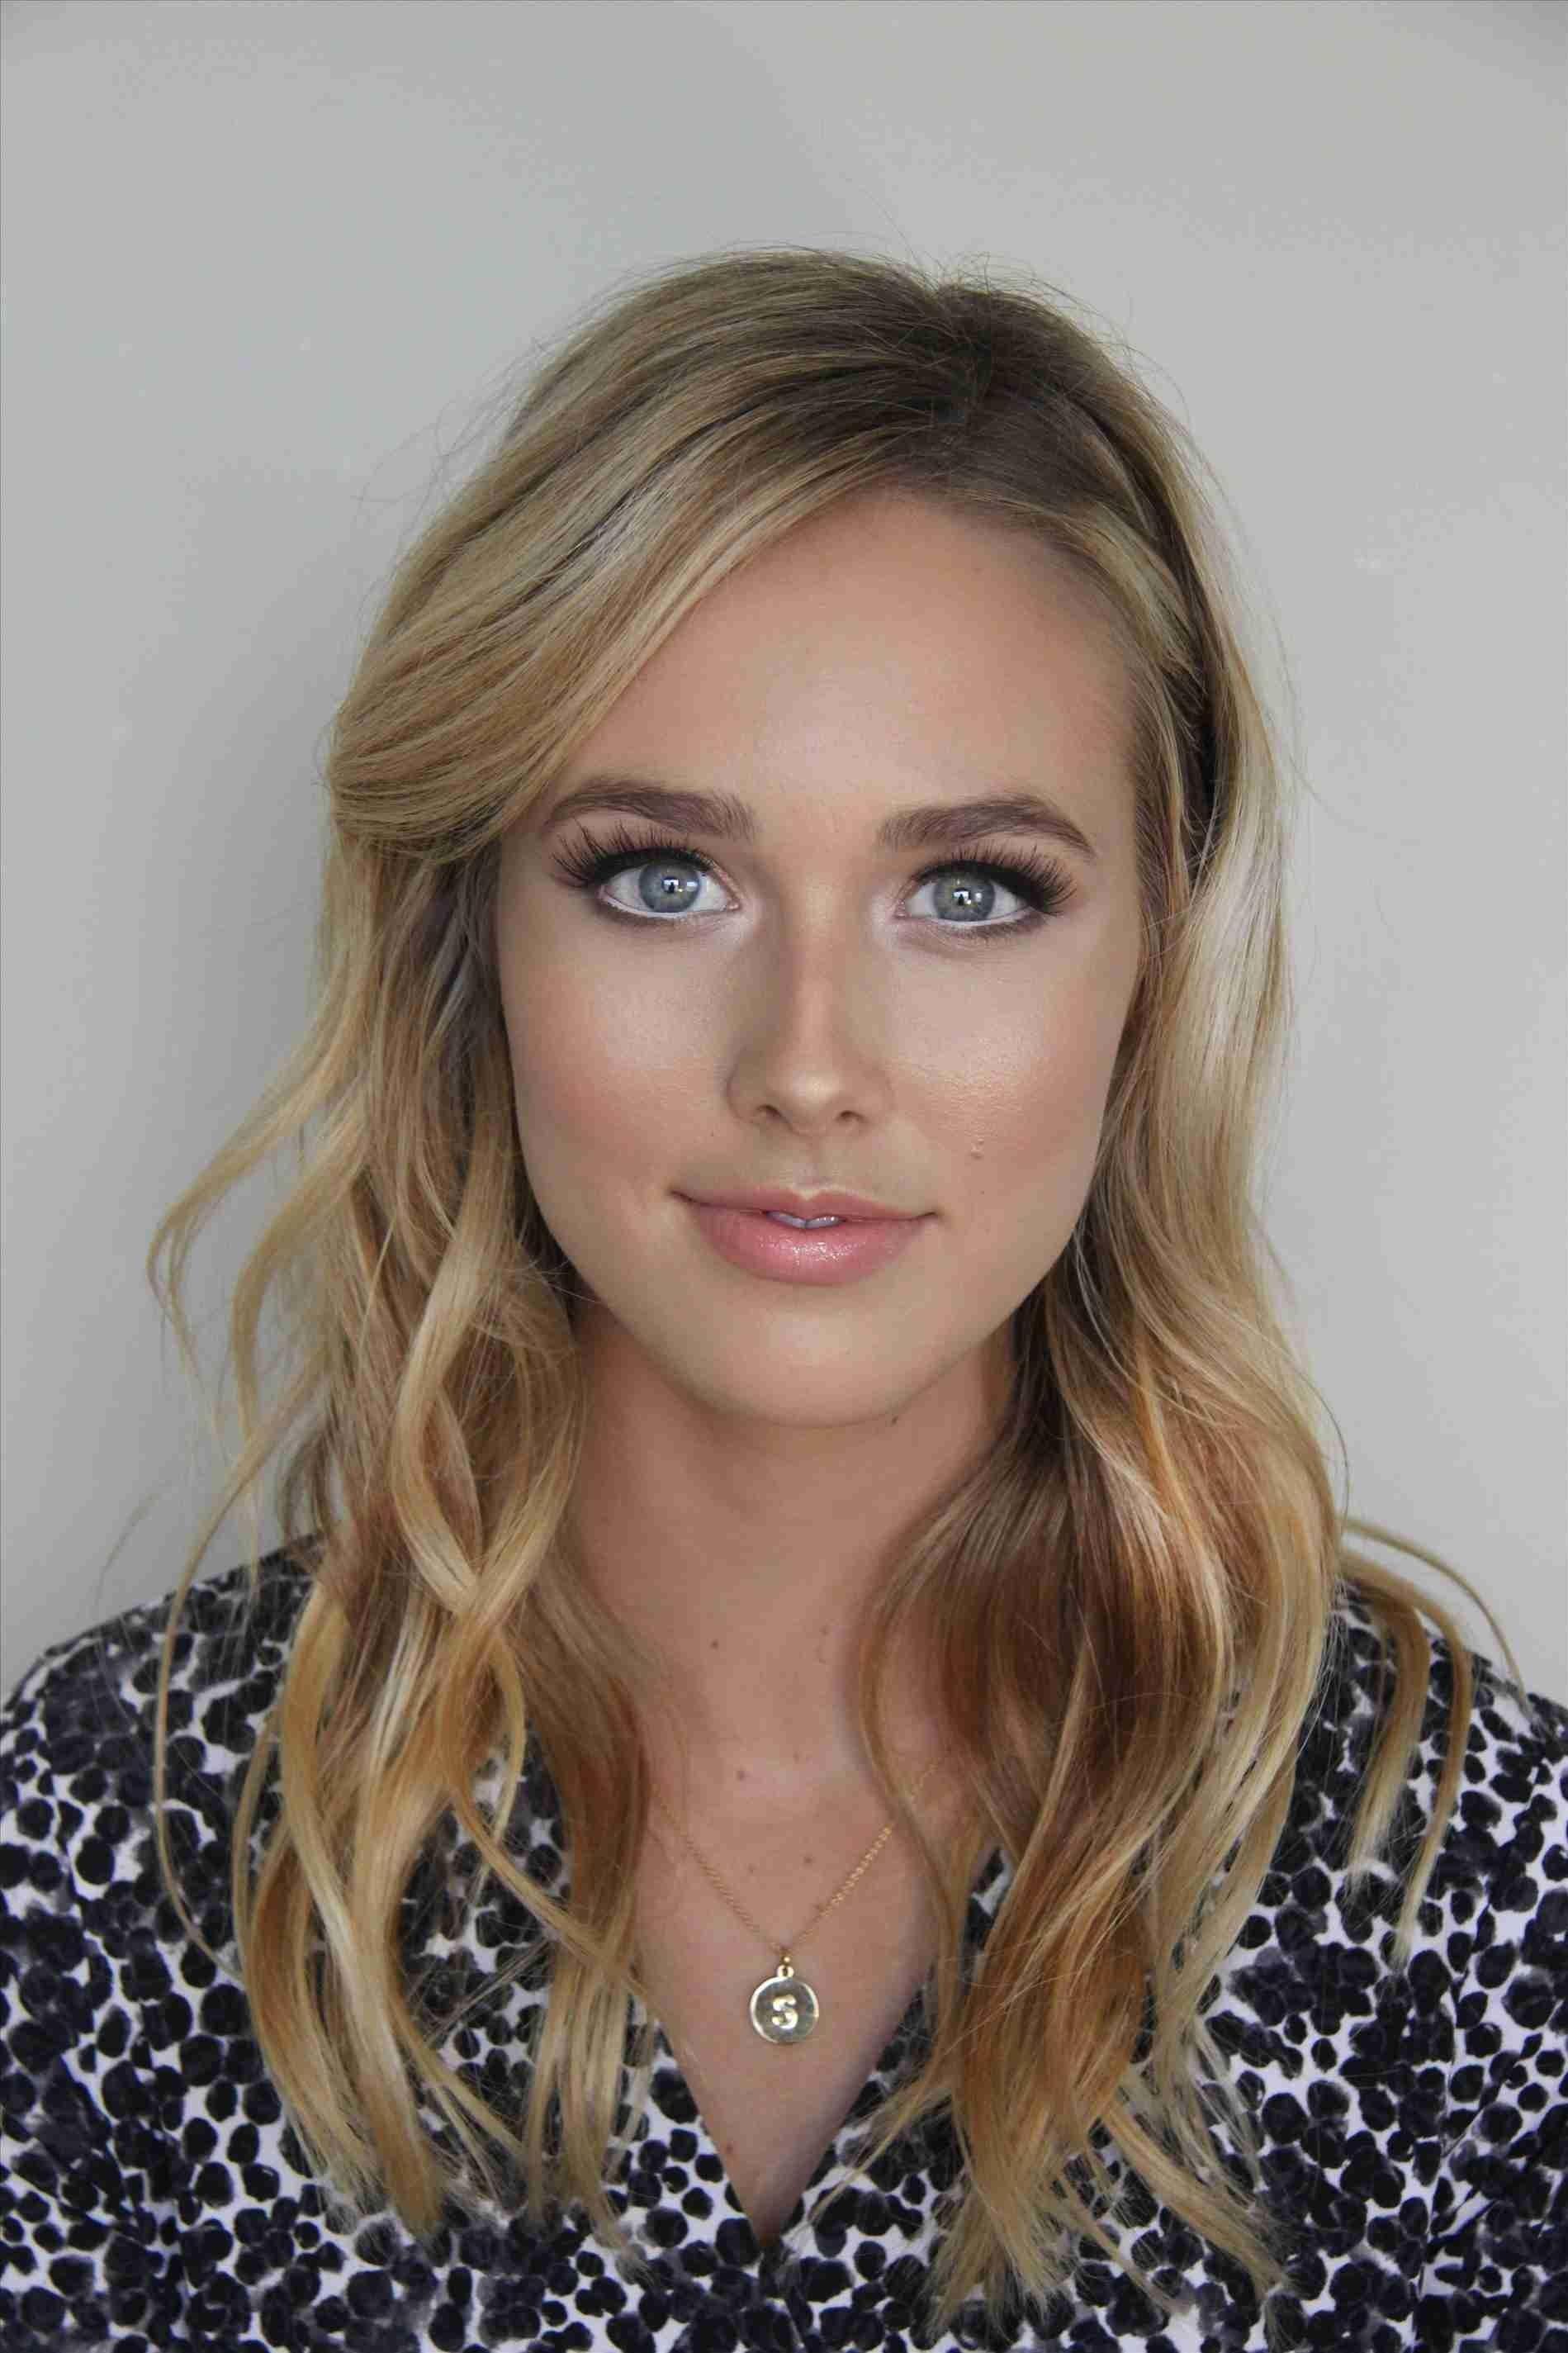 makeup for blonde hair hazel eyes fair skin - wavy haircut